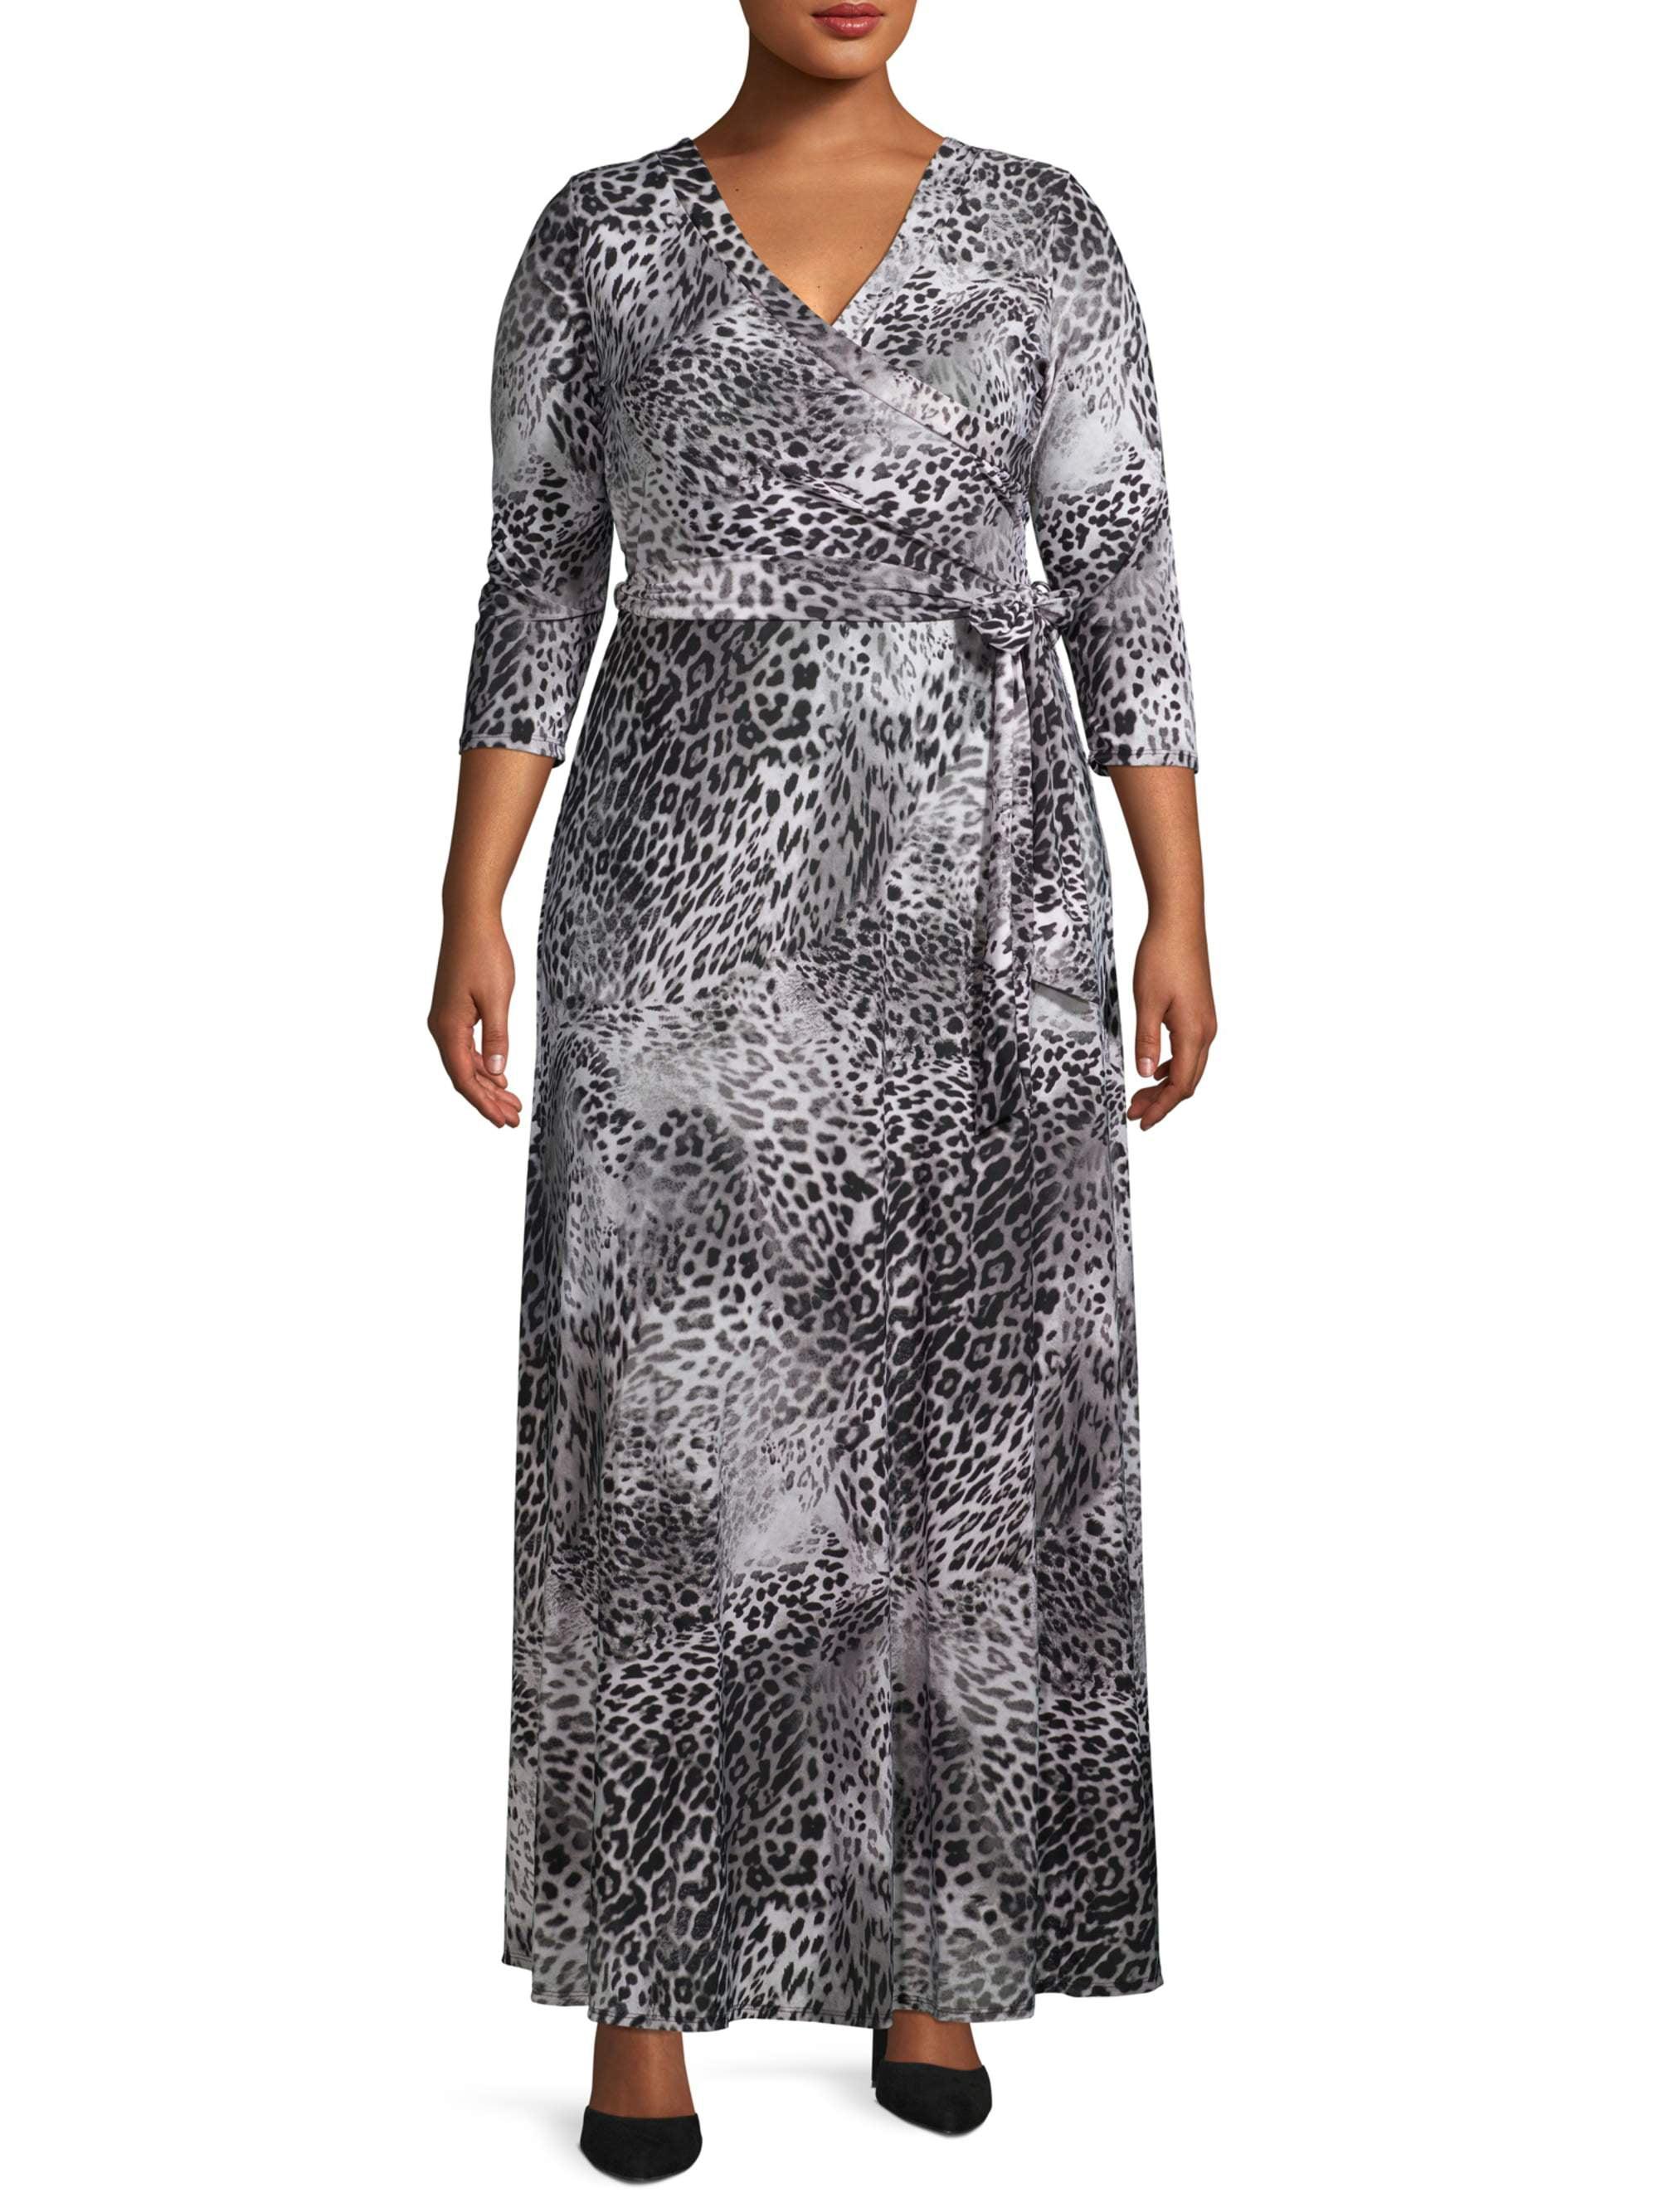 Eileen Fisher Womens White Sleeveless Mock Neck Tunic Top Shirt L BHFO 8250